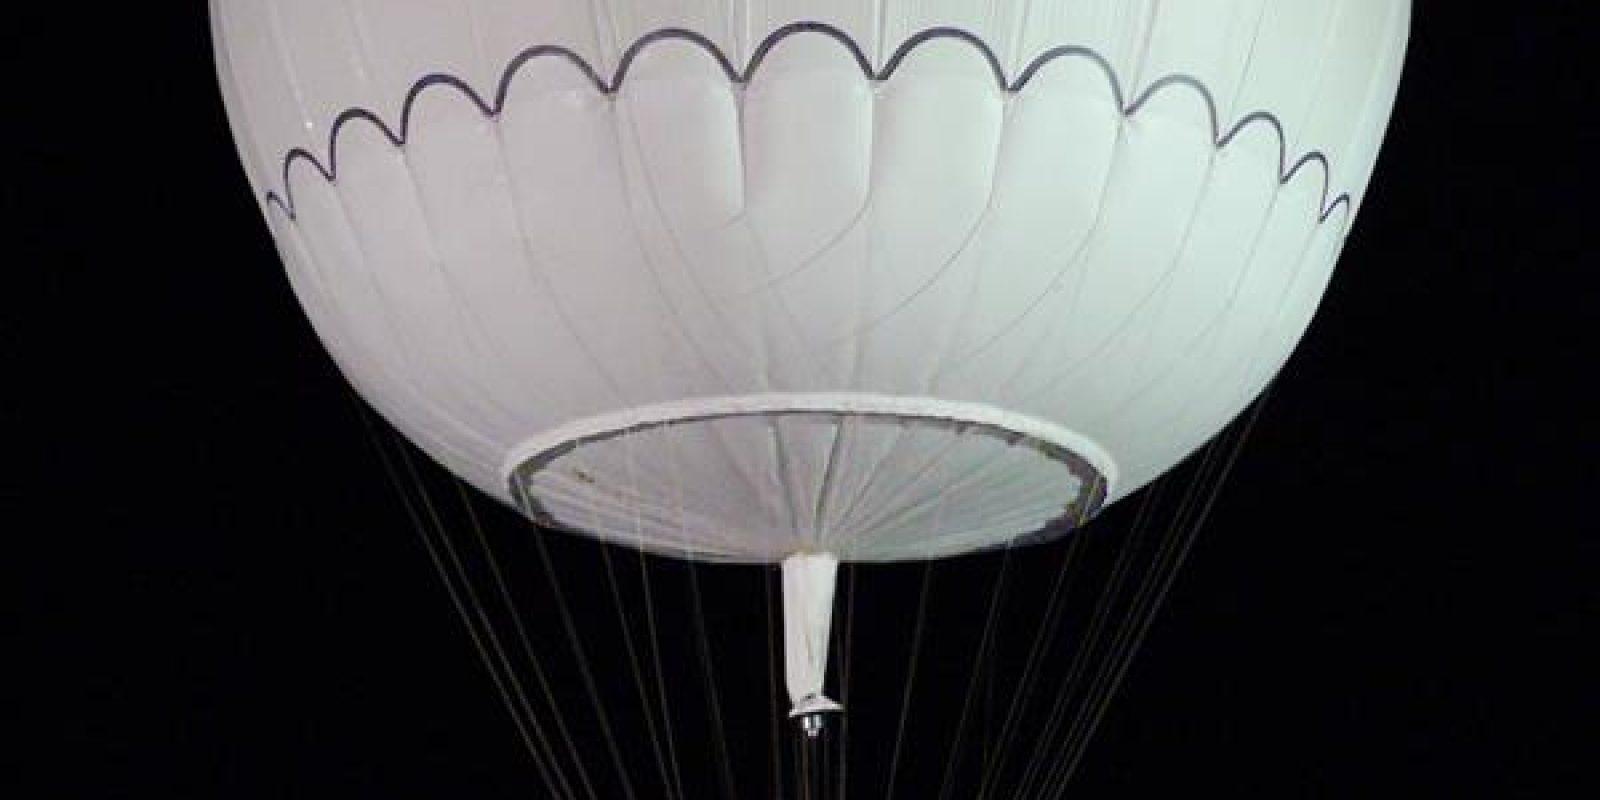 gasballon01.jpg